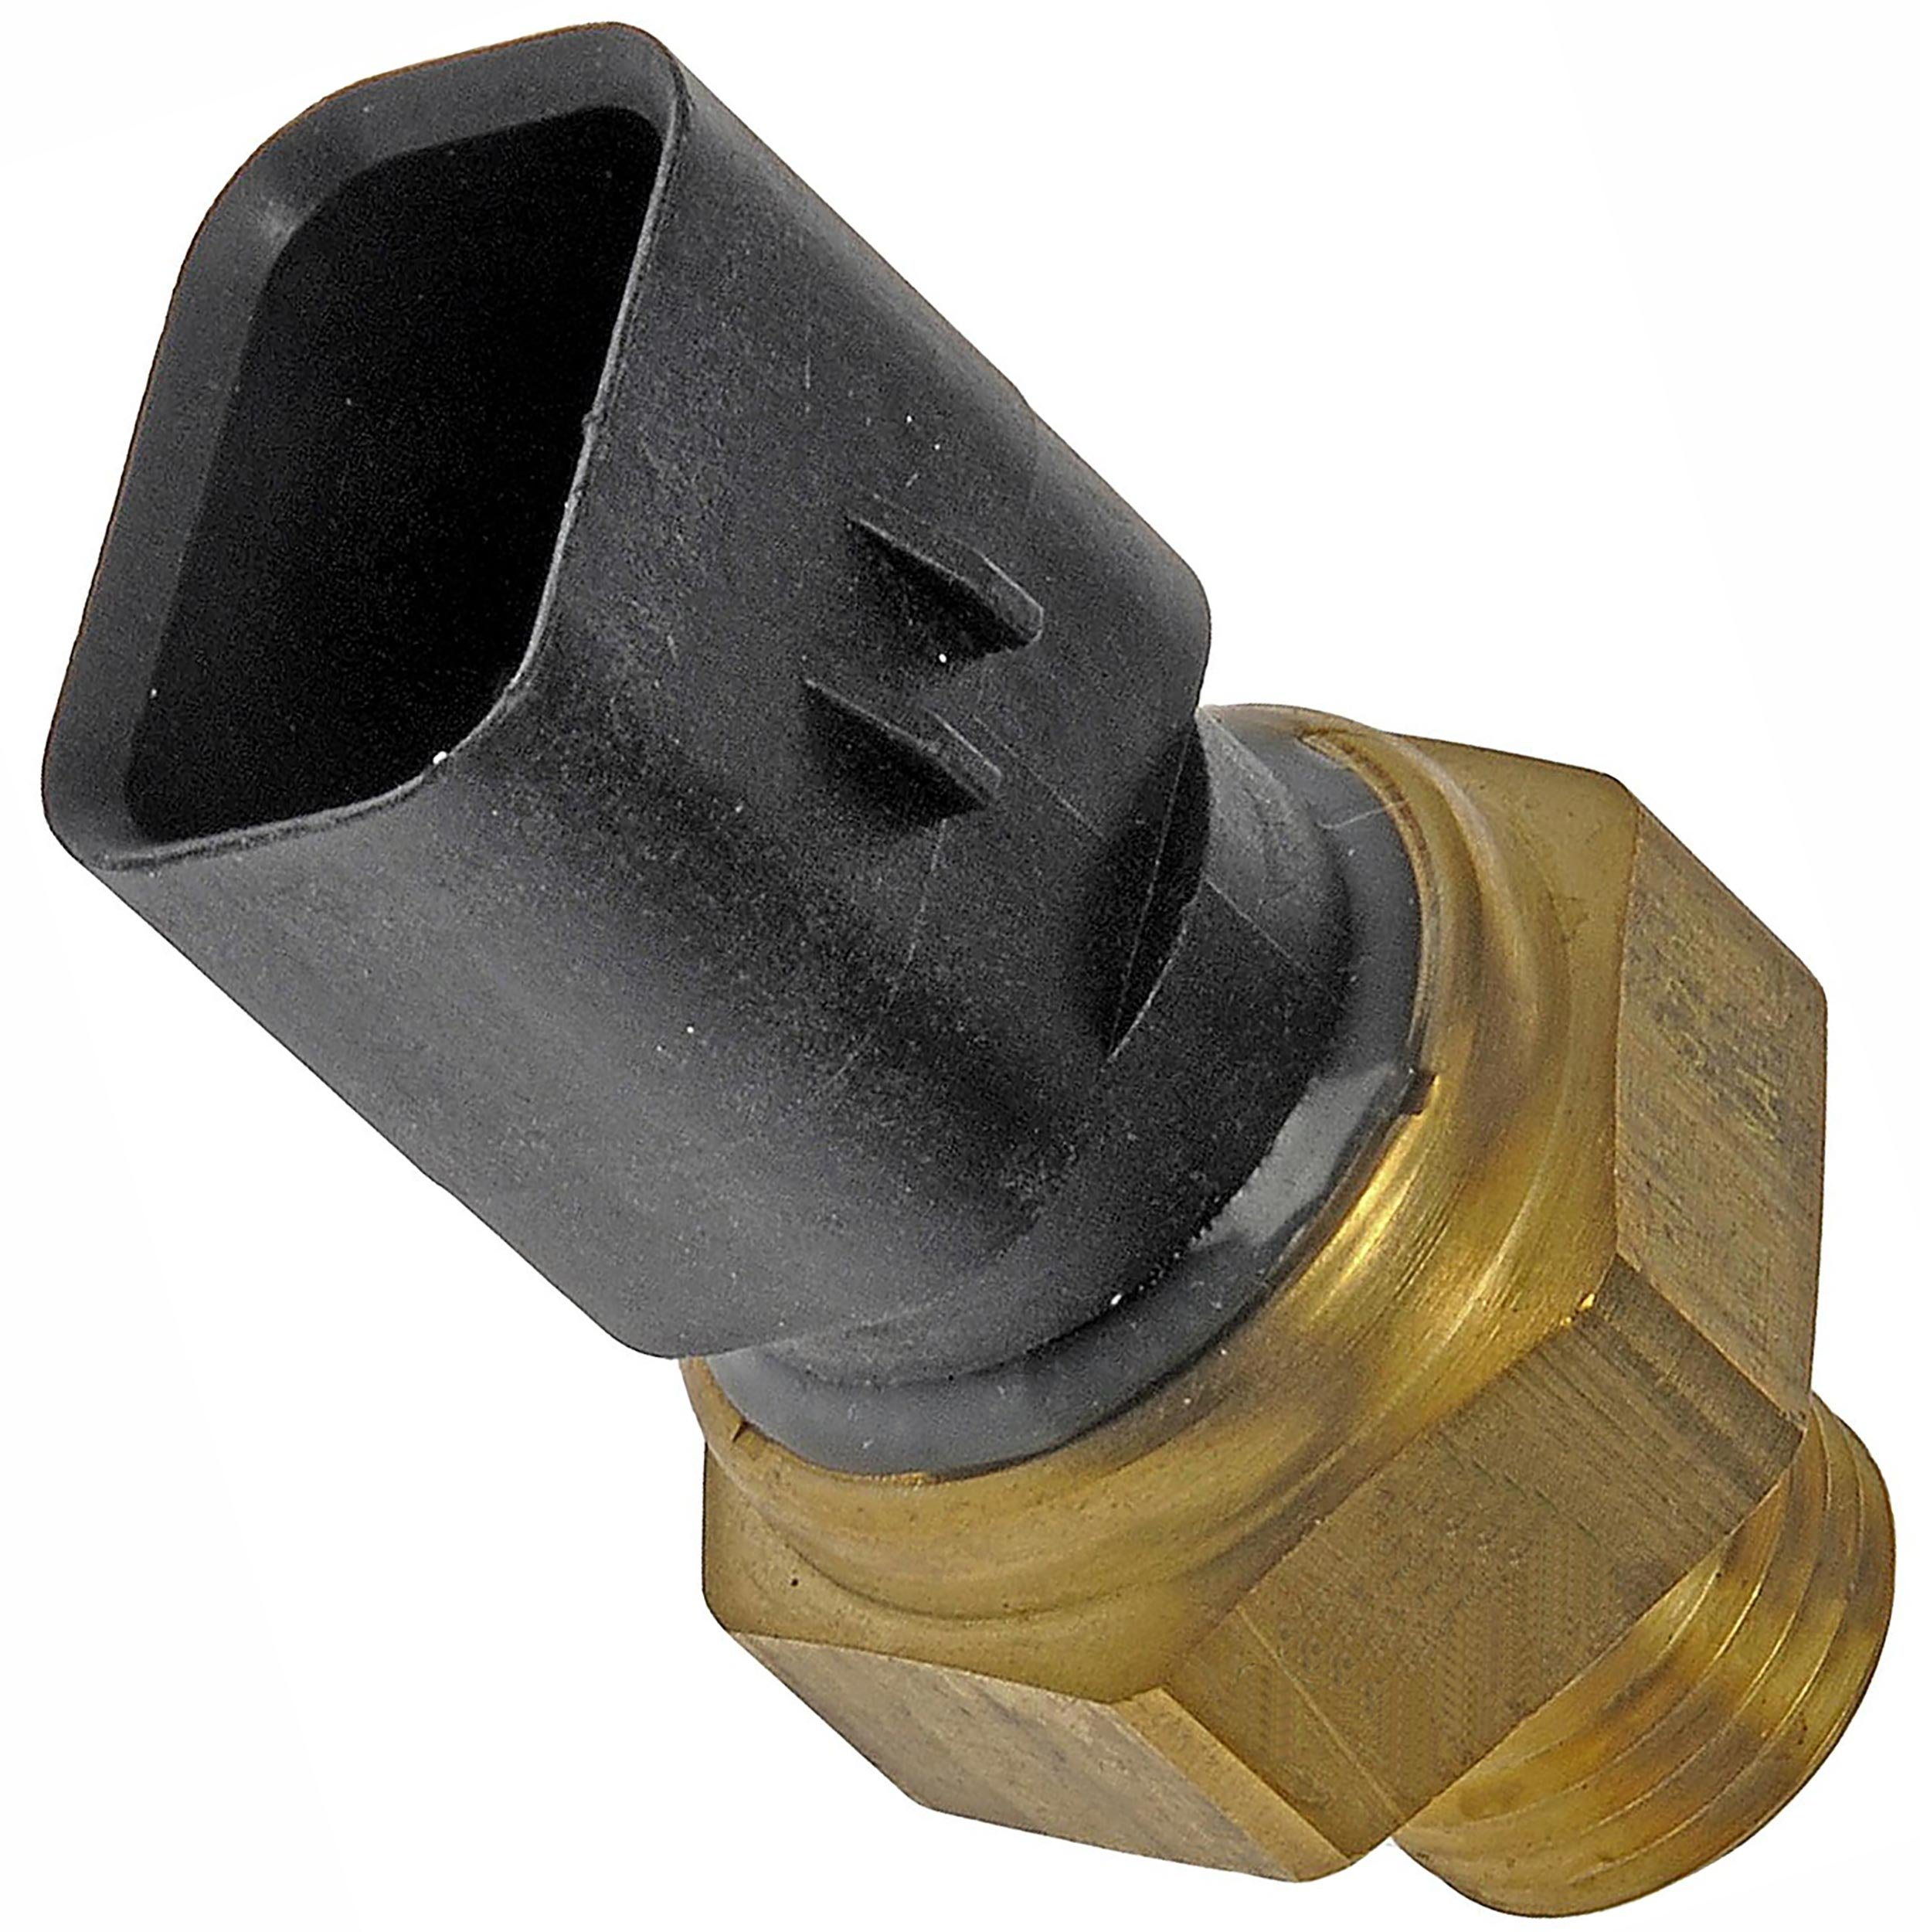 APDTY 138948 Turbocharger Inlet Pressure Sensor Fits Select 2005-2009 Freightliner / International / Kenworth / Peterbilt / Sterling Truck / Western Star (Replaces 2482162, 2746717)